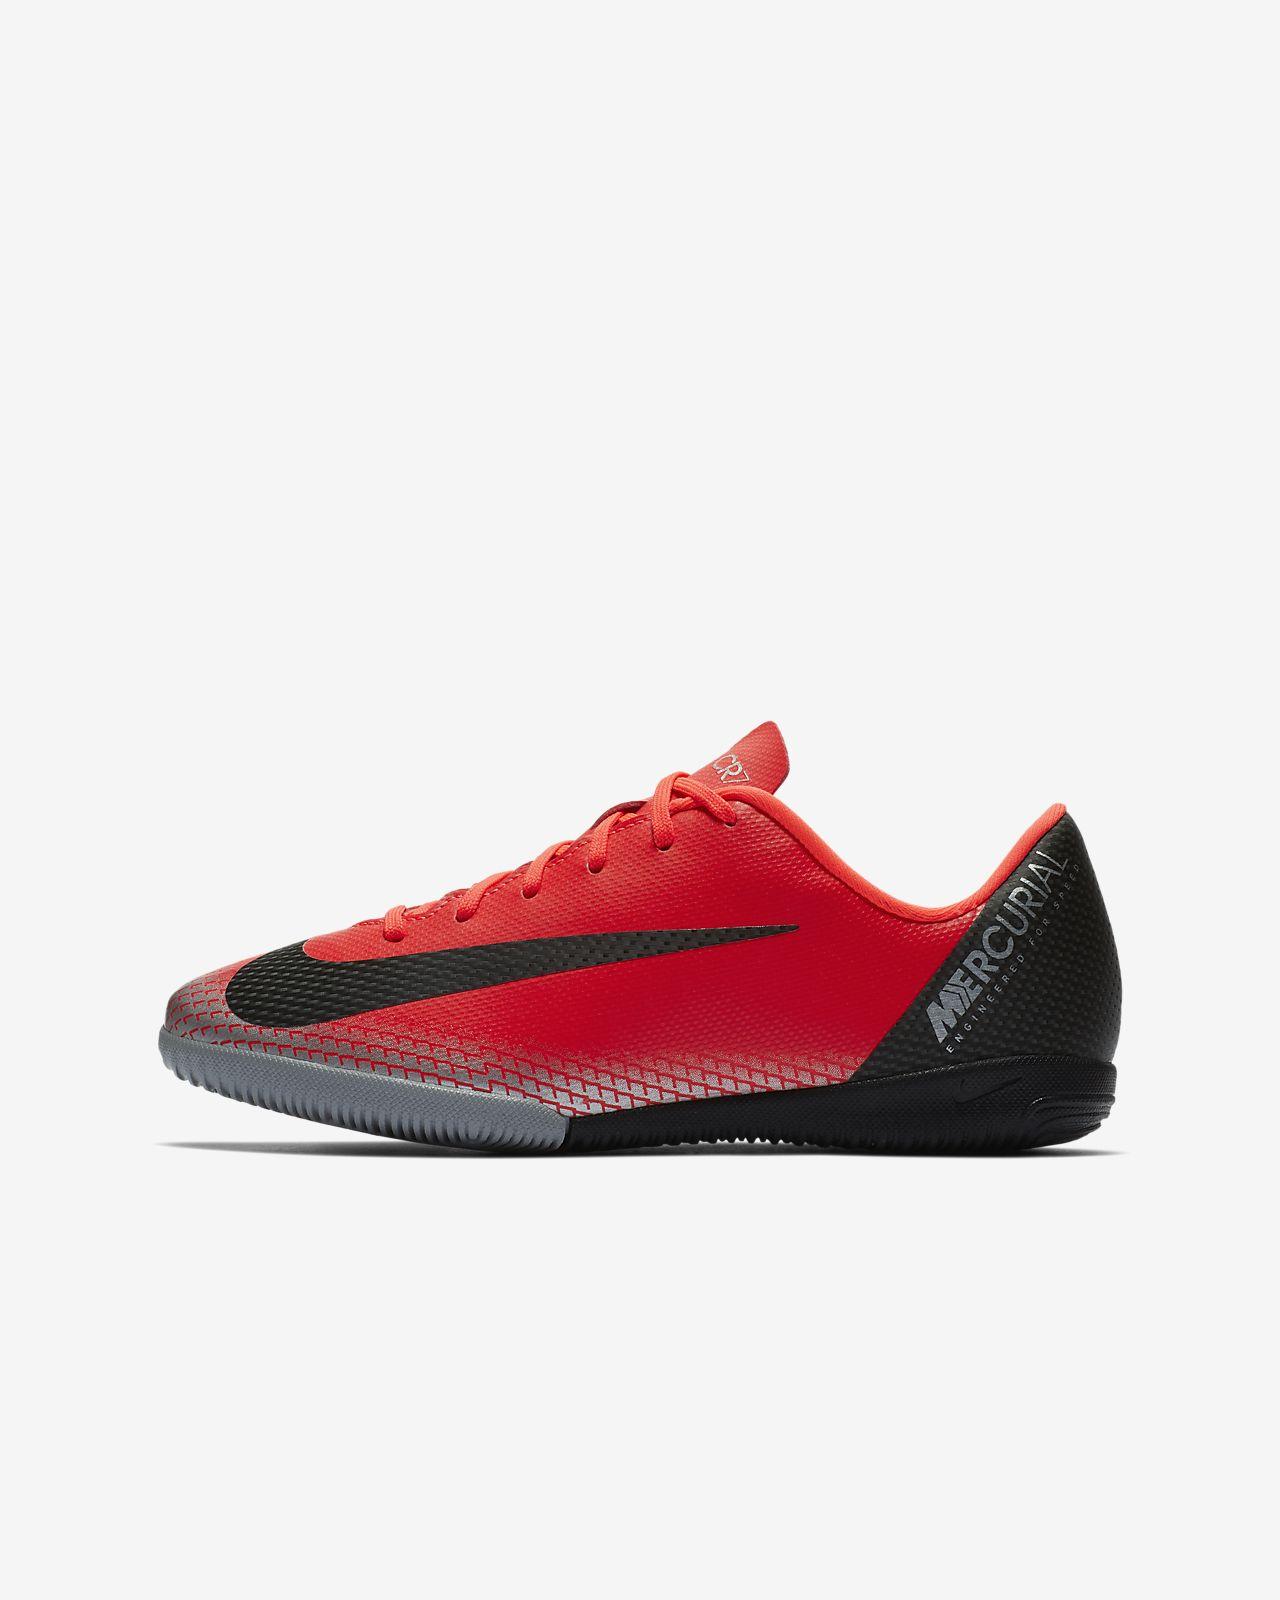 Nike Jr. MercurialX Vapor XII Academy CR7 Botas de fútbol sala - Niño/a y niño/a pequeño/a